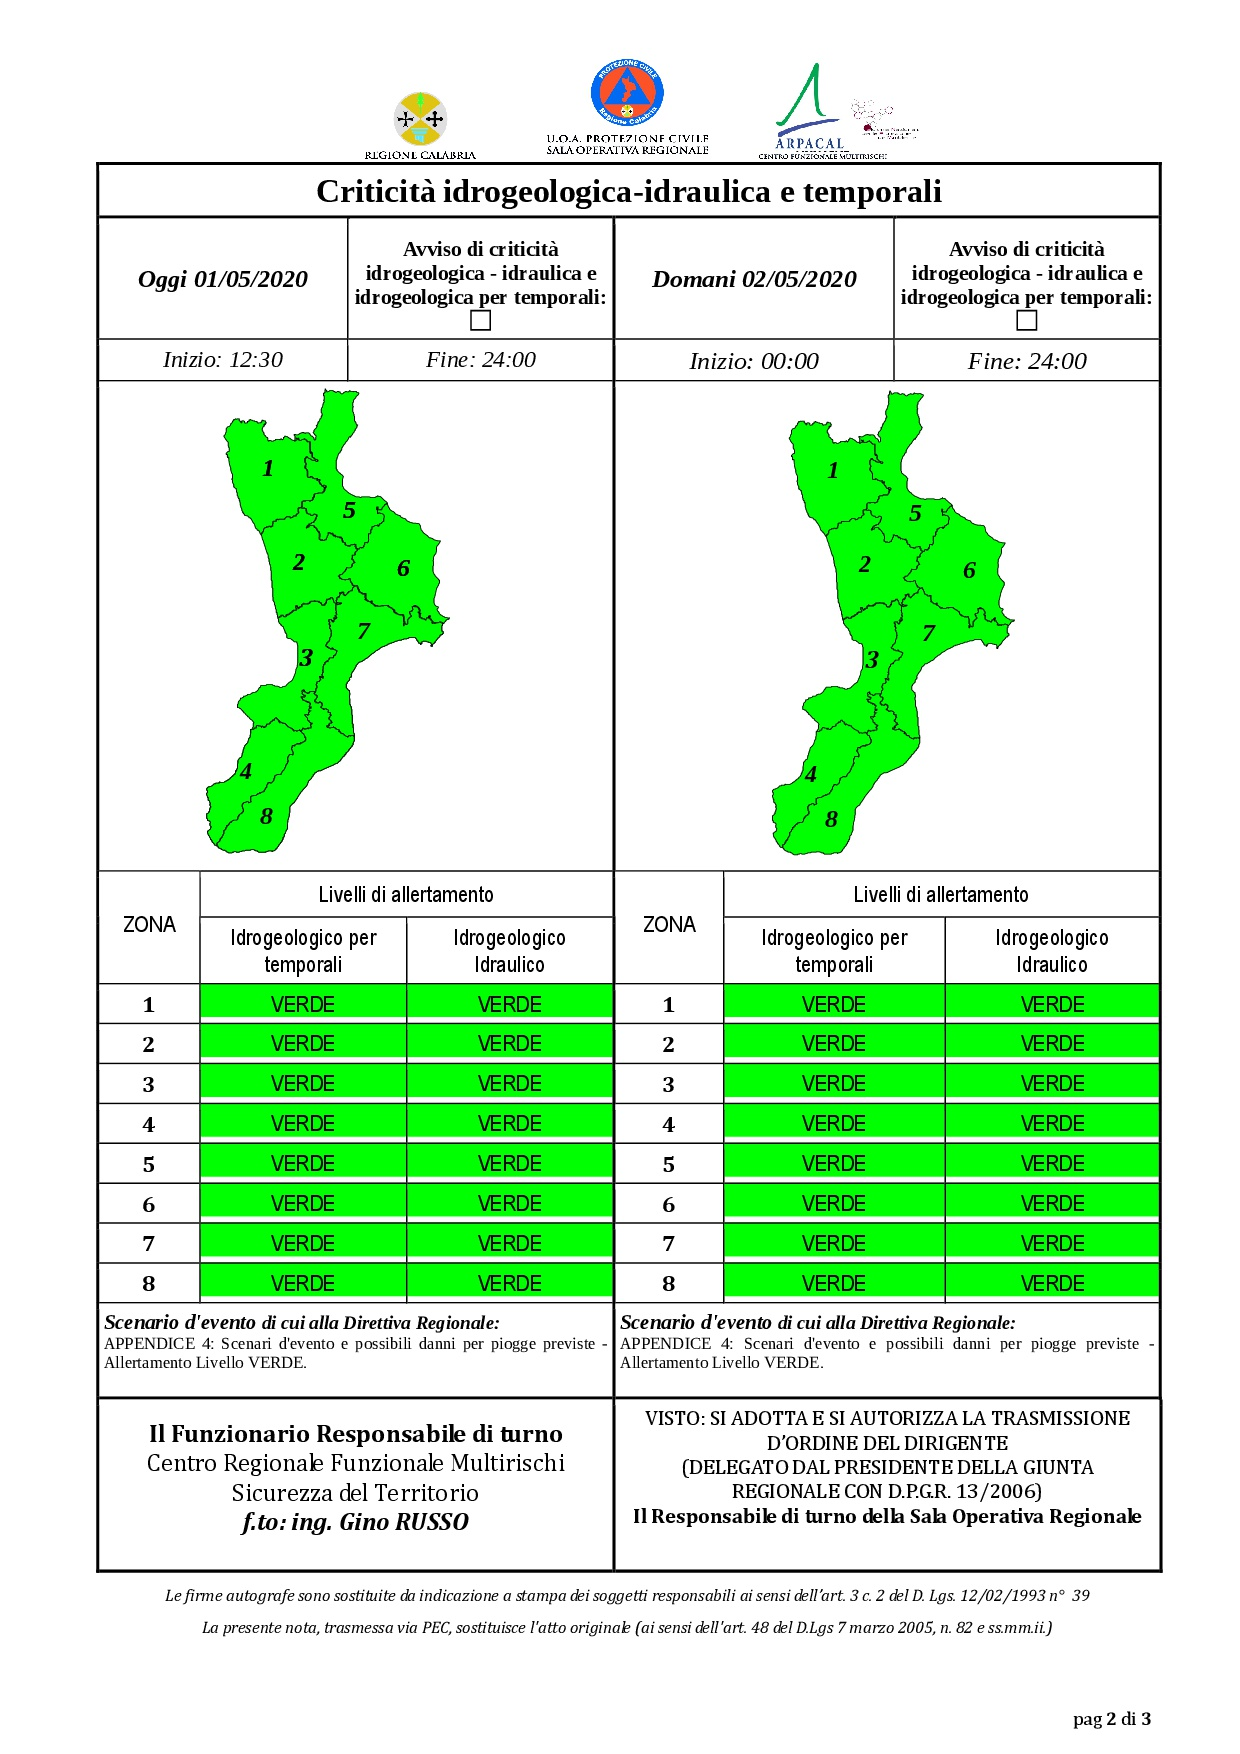 Criticità idrogeologica-idraulica e temporali in Calabria 01-05-2020